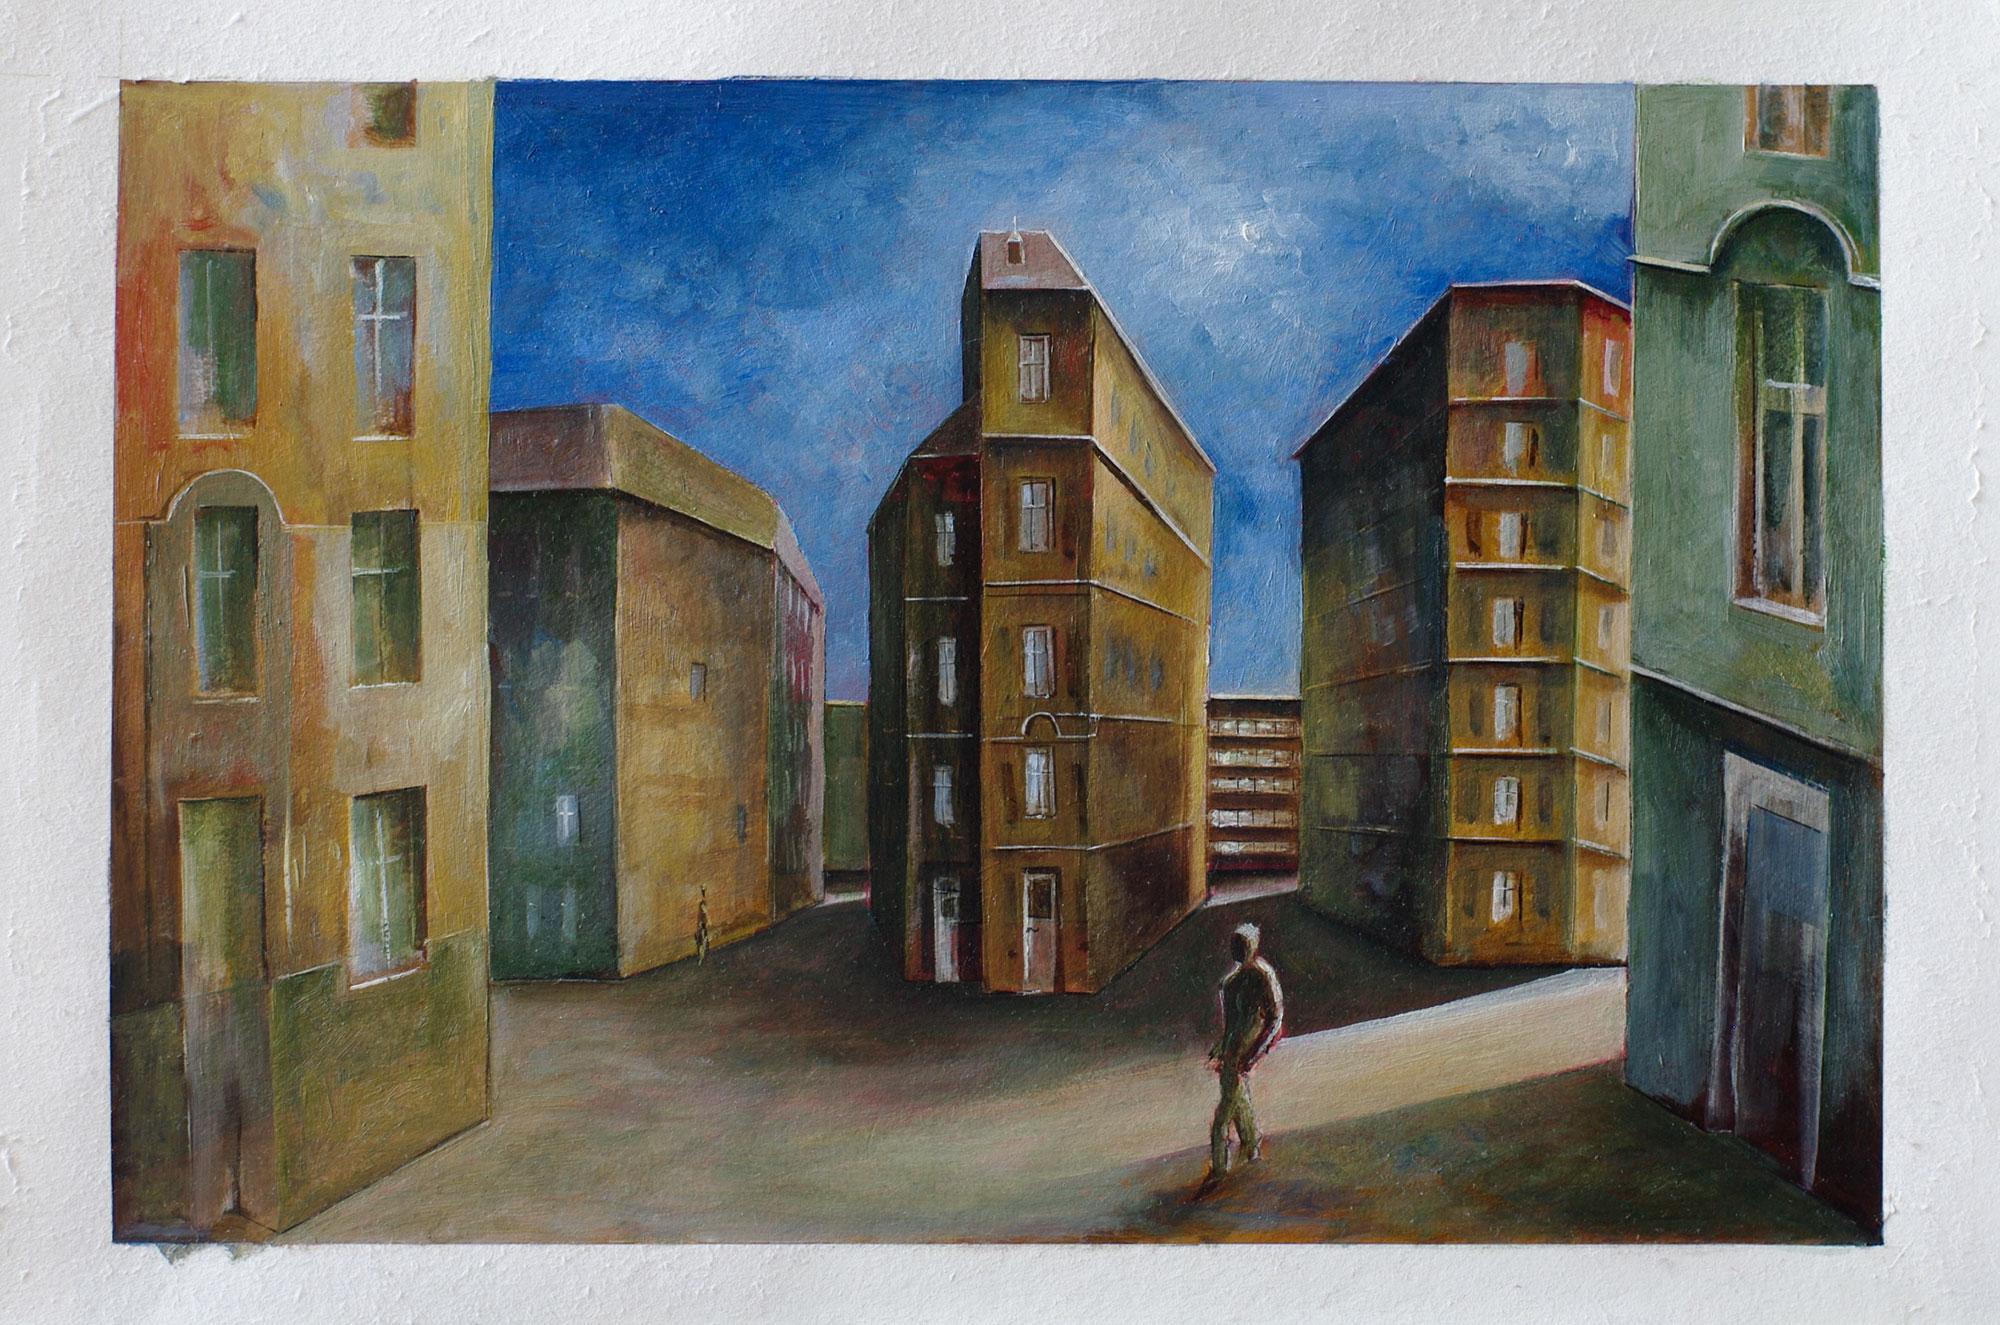 »Stille«, Benjamin Kerwien, Mischtechnik auf Papier, 30 x 20 cm, 2014